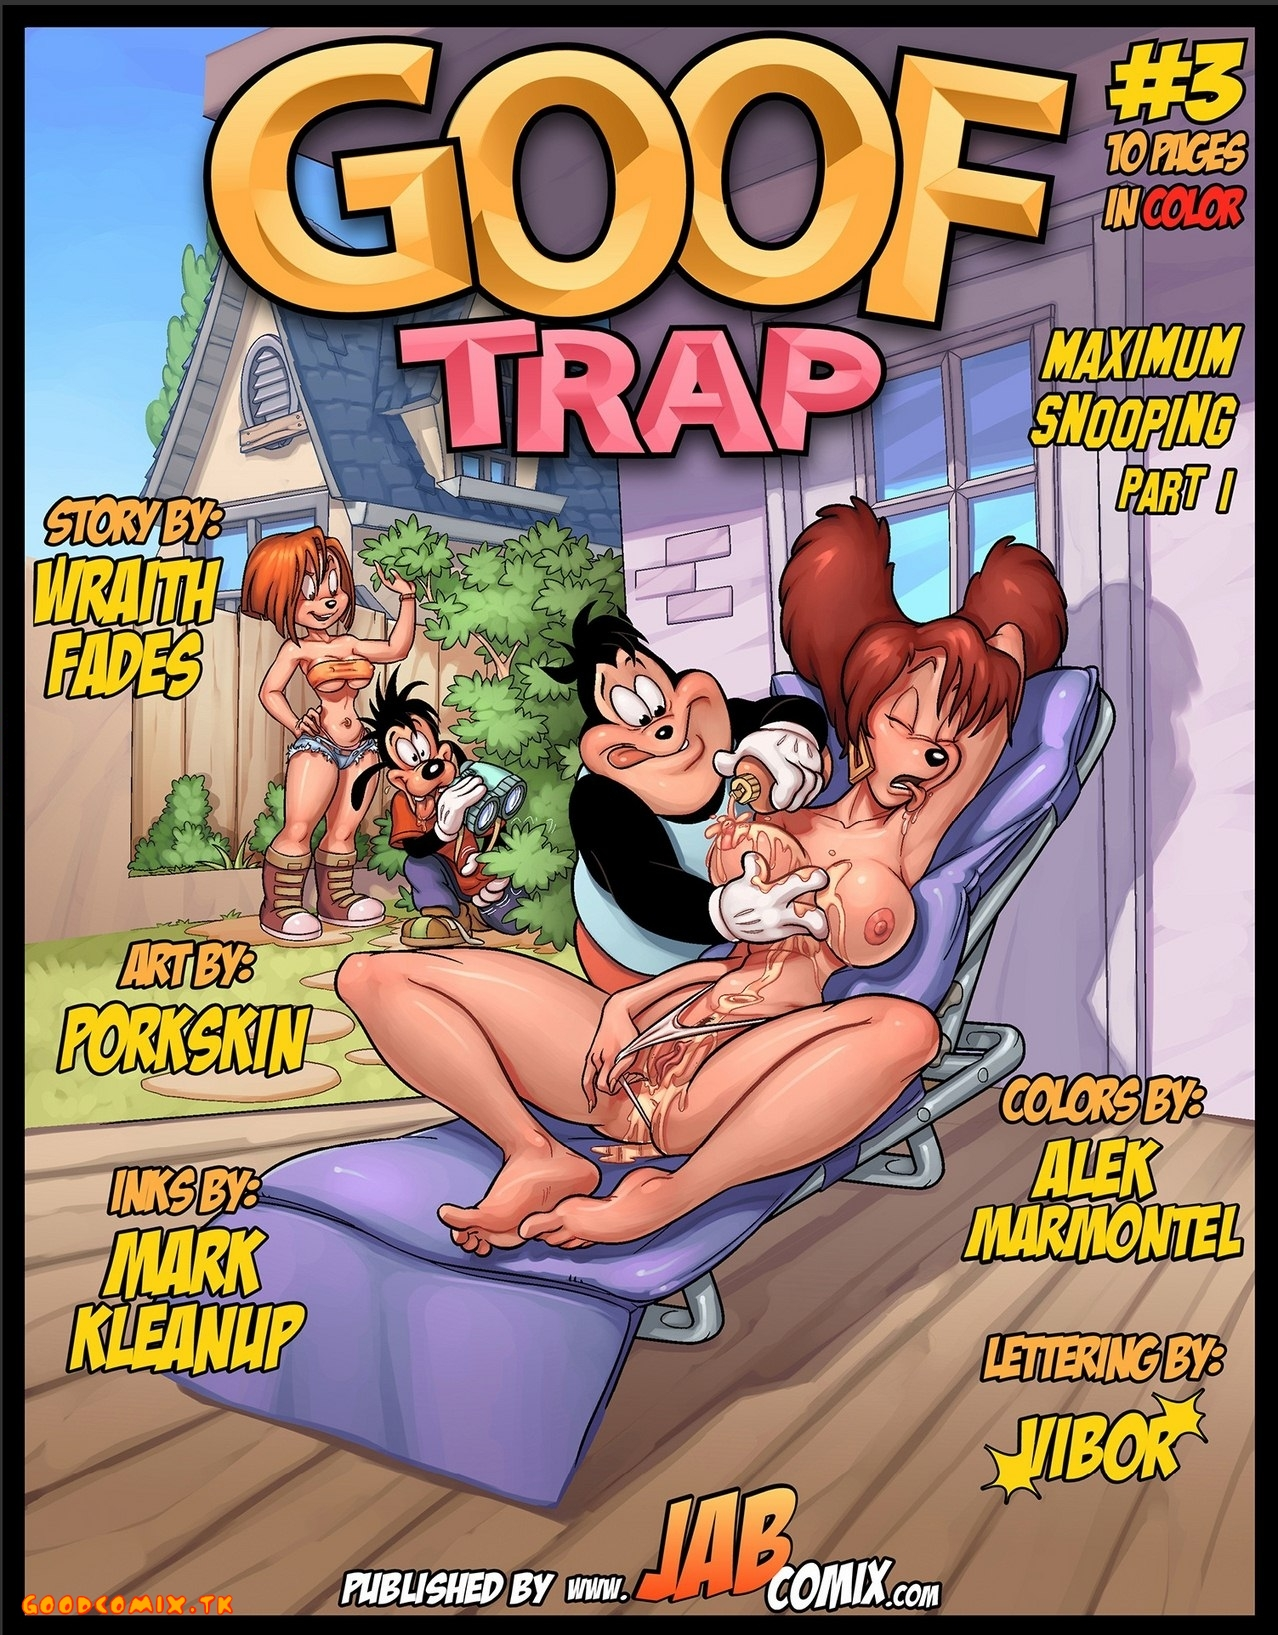 Goodcomix Goof Troop - [JabComix] - Goof Trap 3 - Maximum Snooping